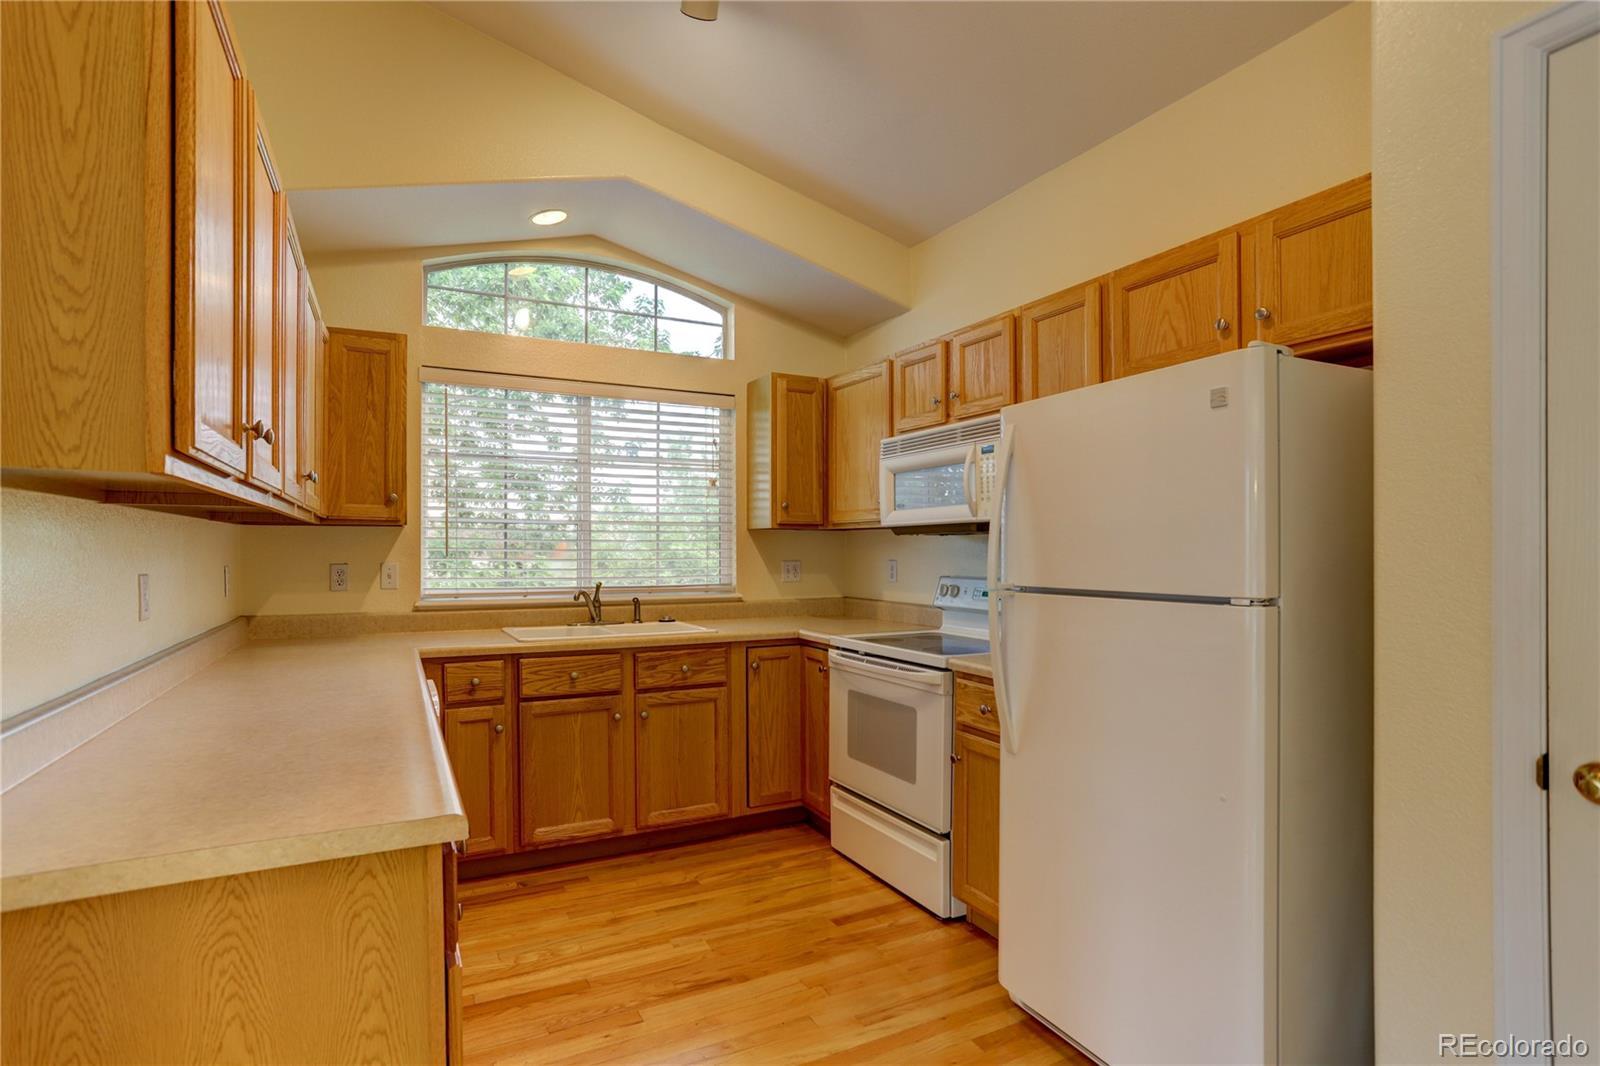 MLS# 2836182 - 10 - 7700 W Grant Ranch Boulevard #10D, Littleton, CO 80123